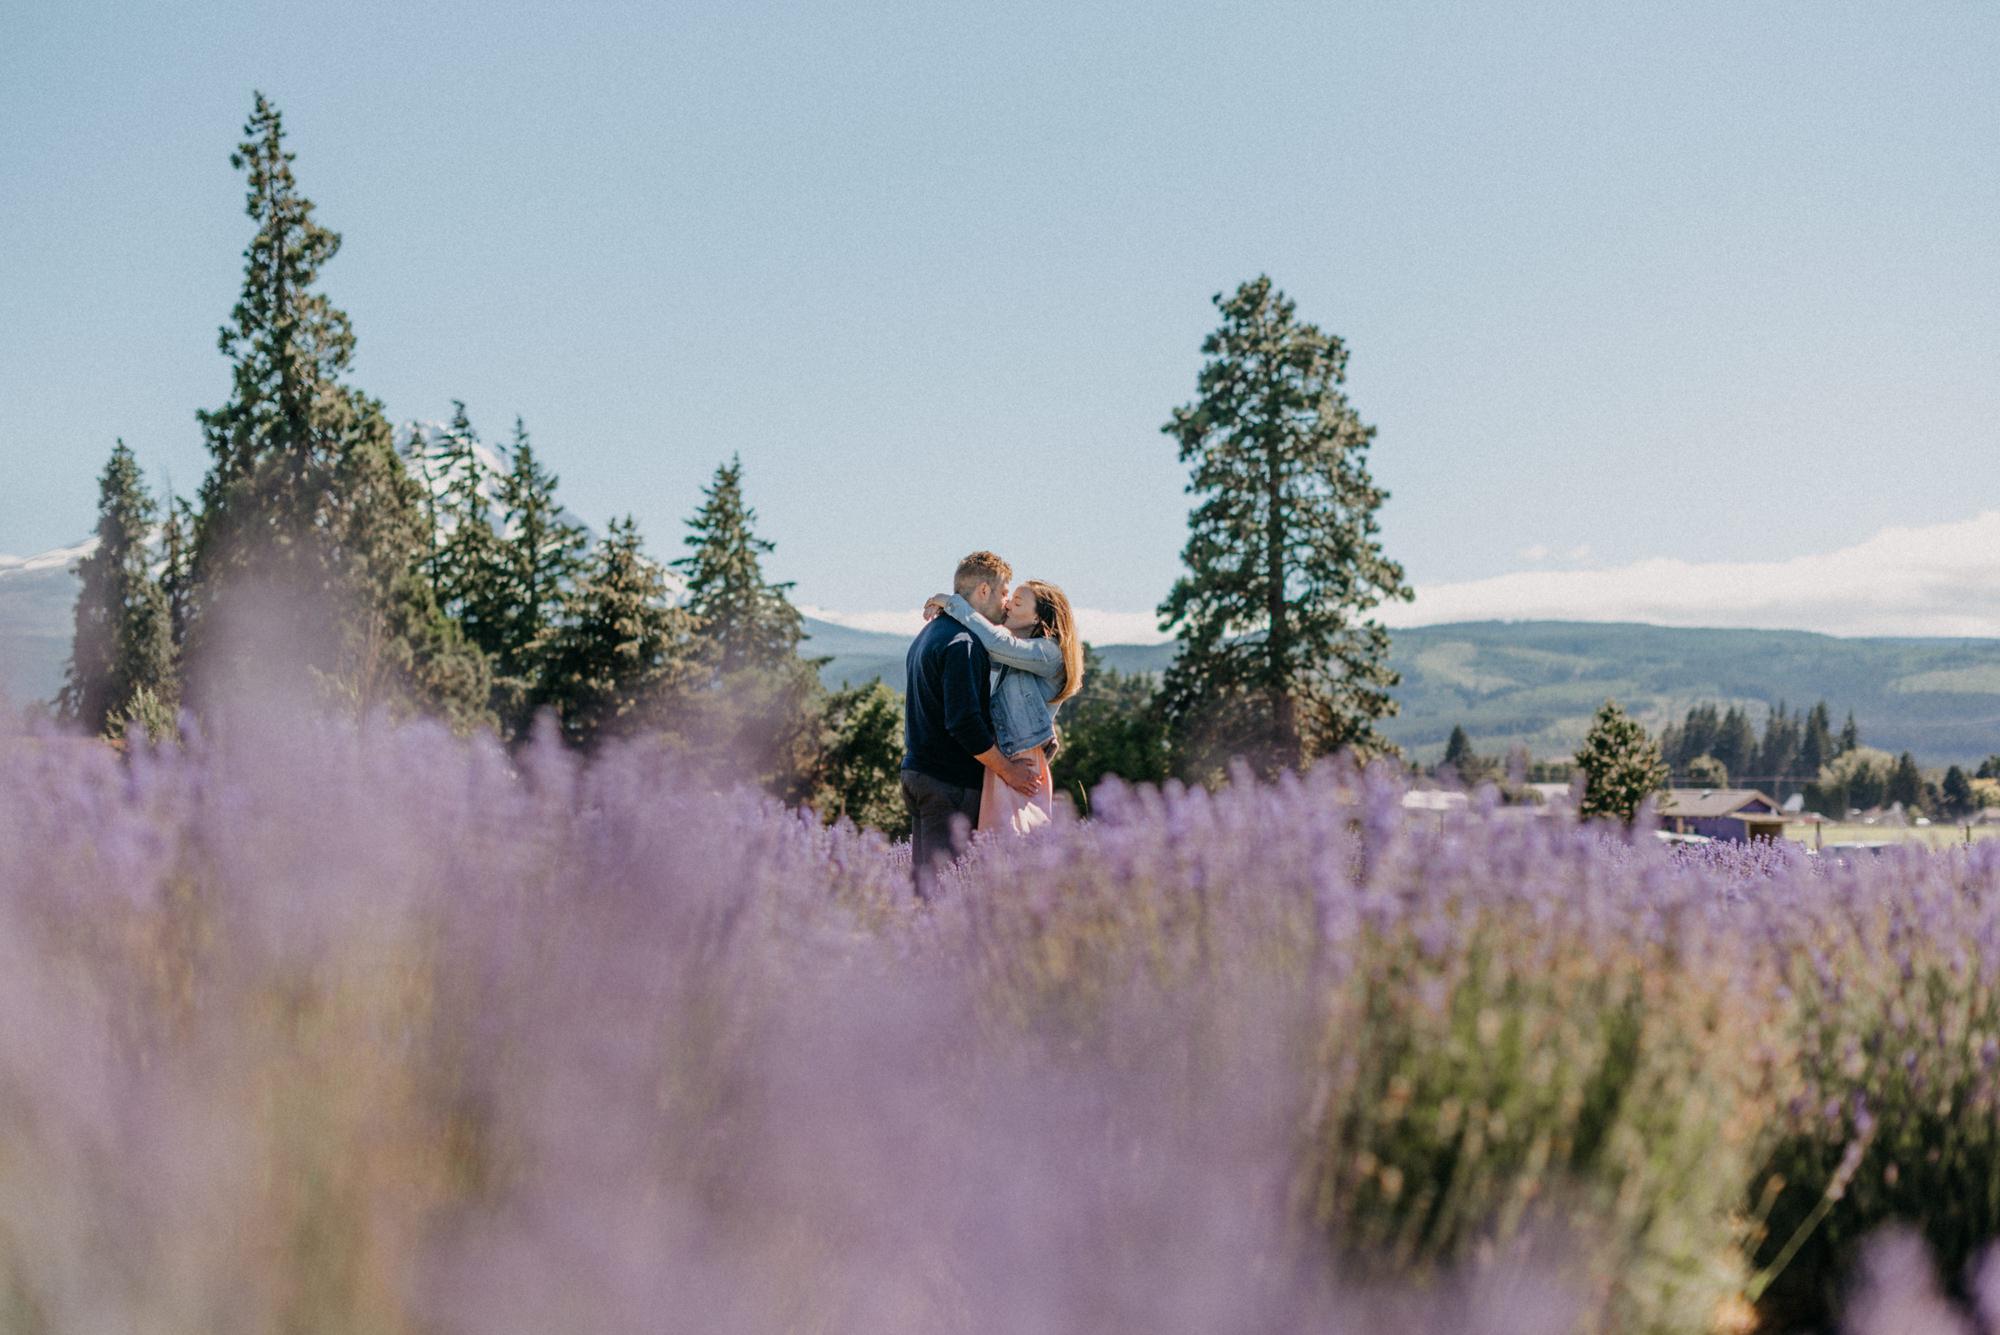 10-Mt-hood-lavender-farms-engagment-couple-summer-7166.jpg